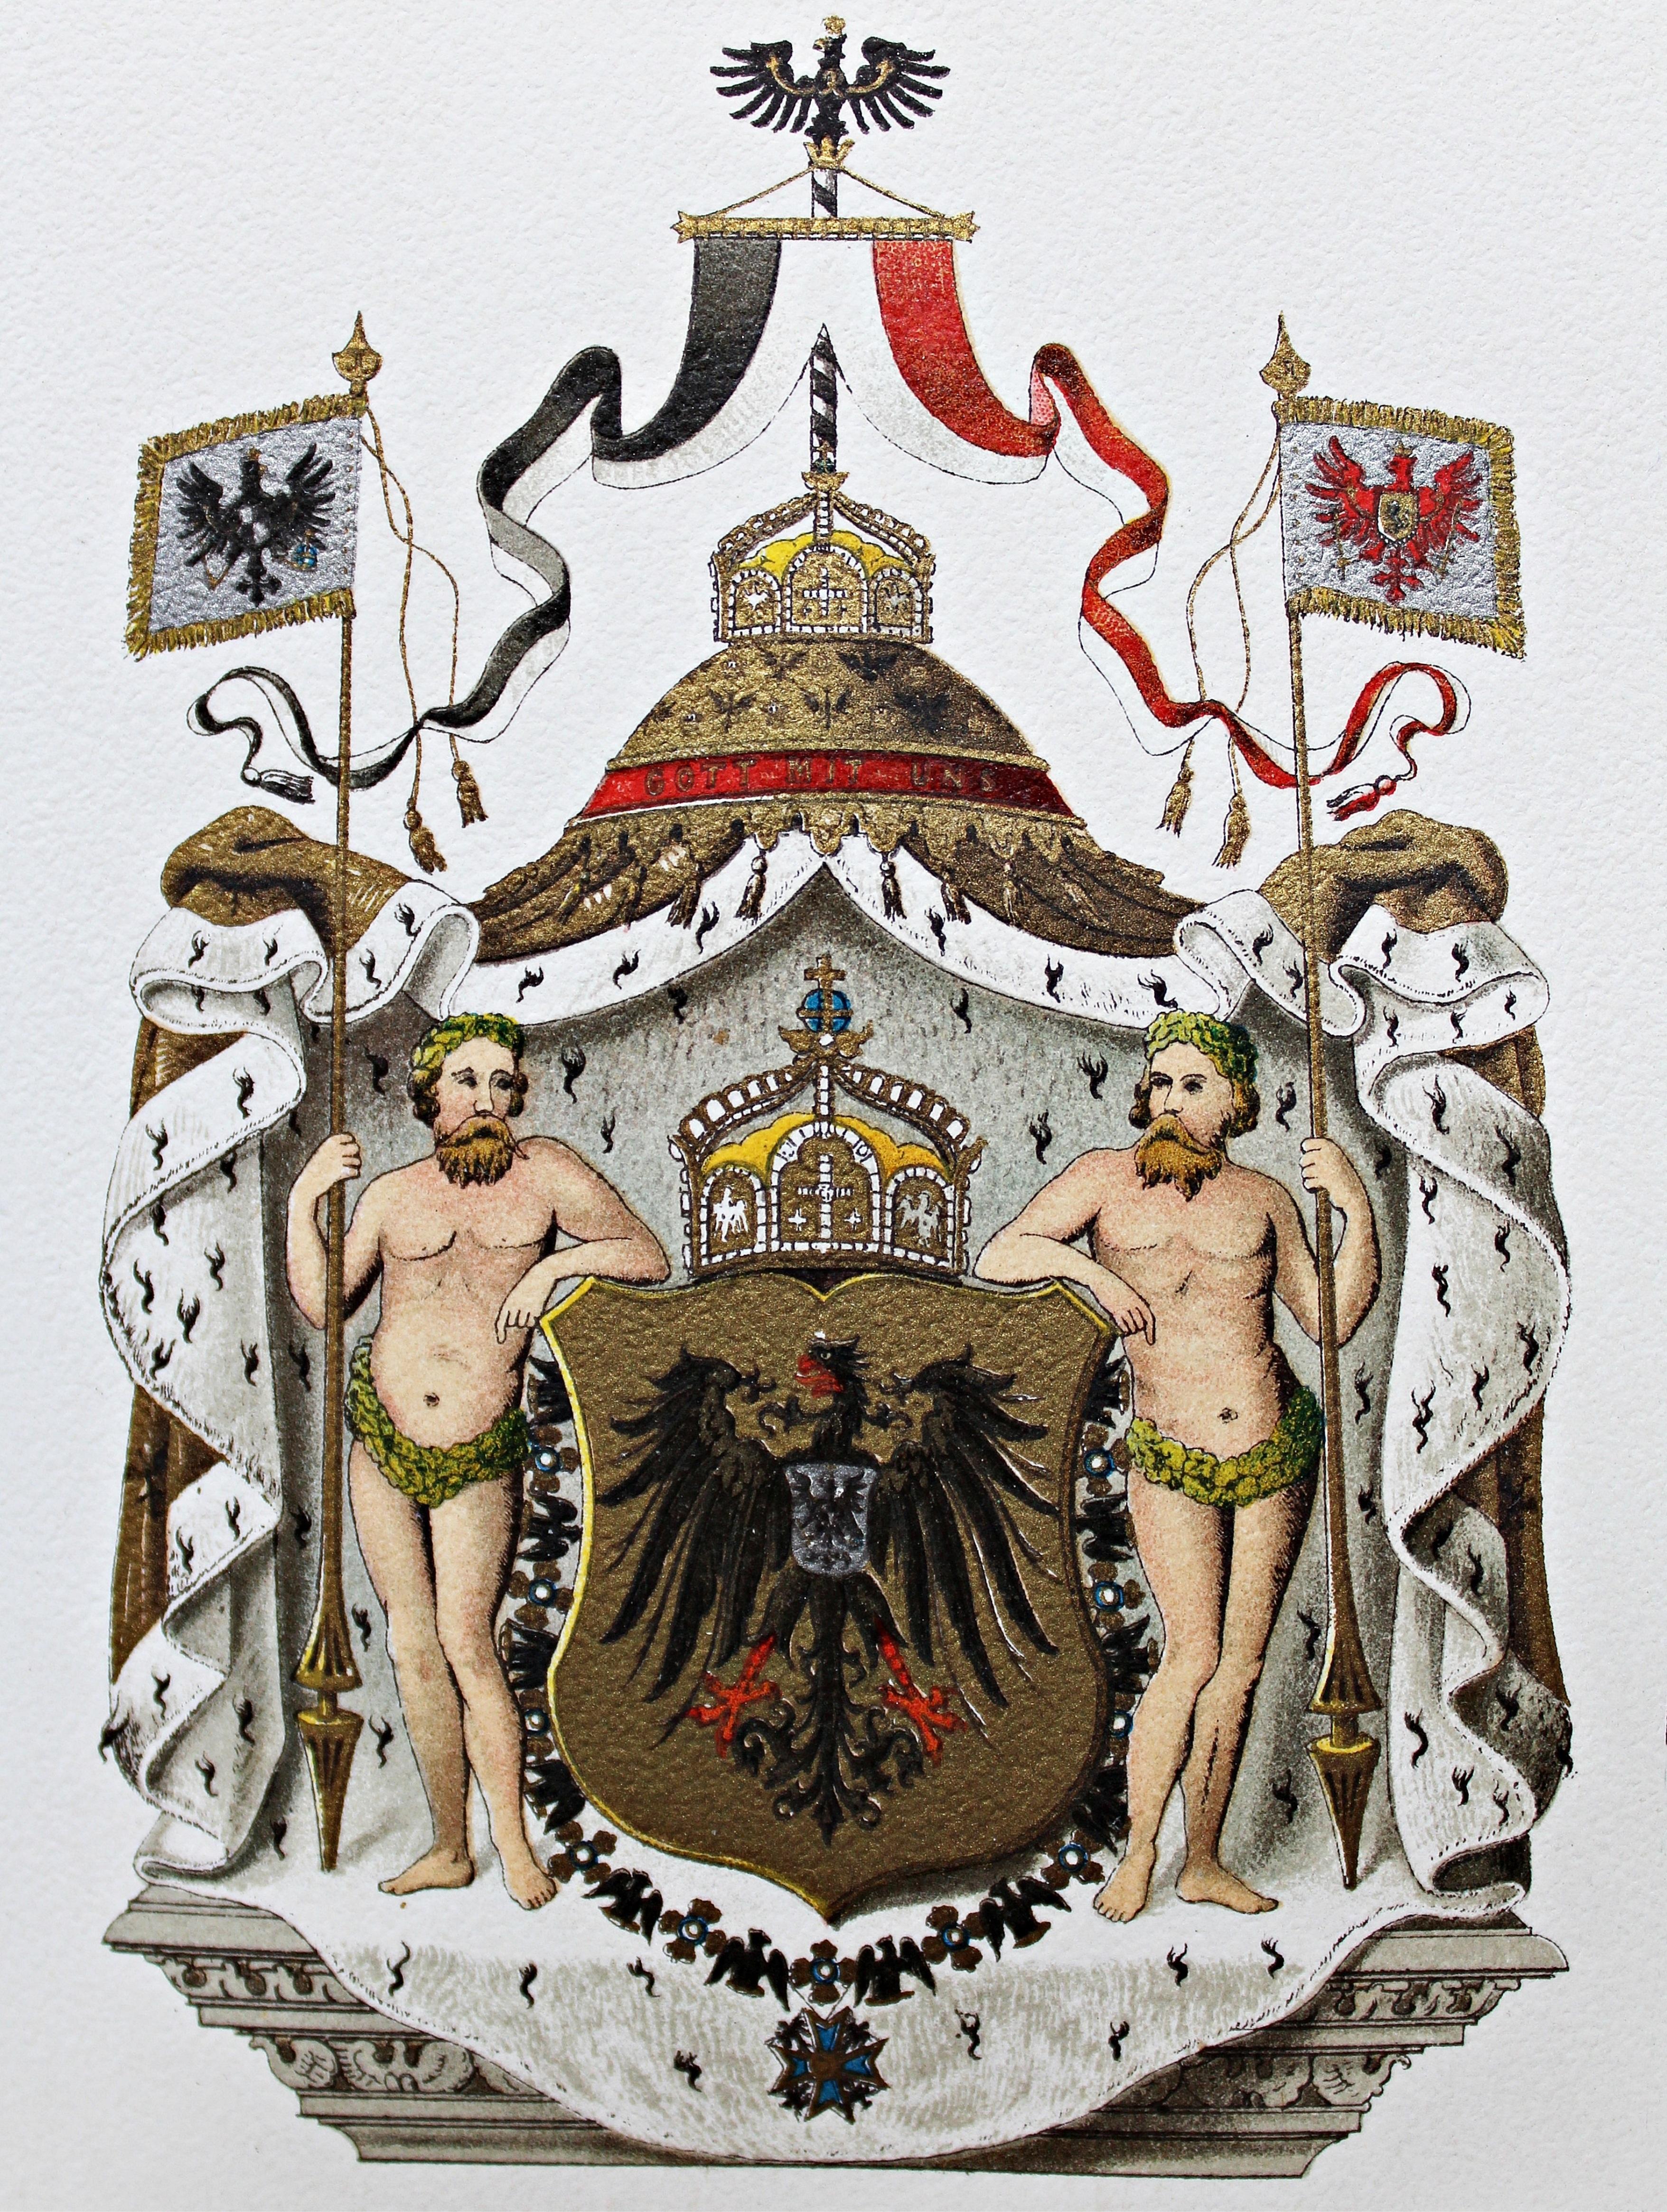 Gambar Spanduk Mebel Seni Ilustrasi Bendera Kerajaan Gambar